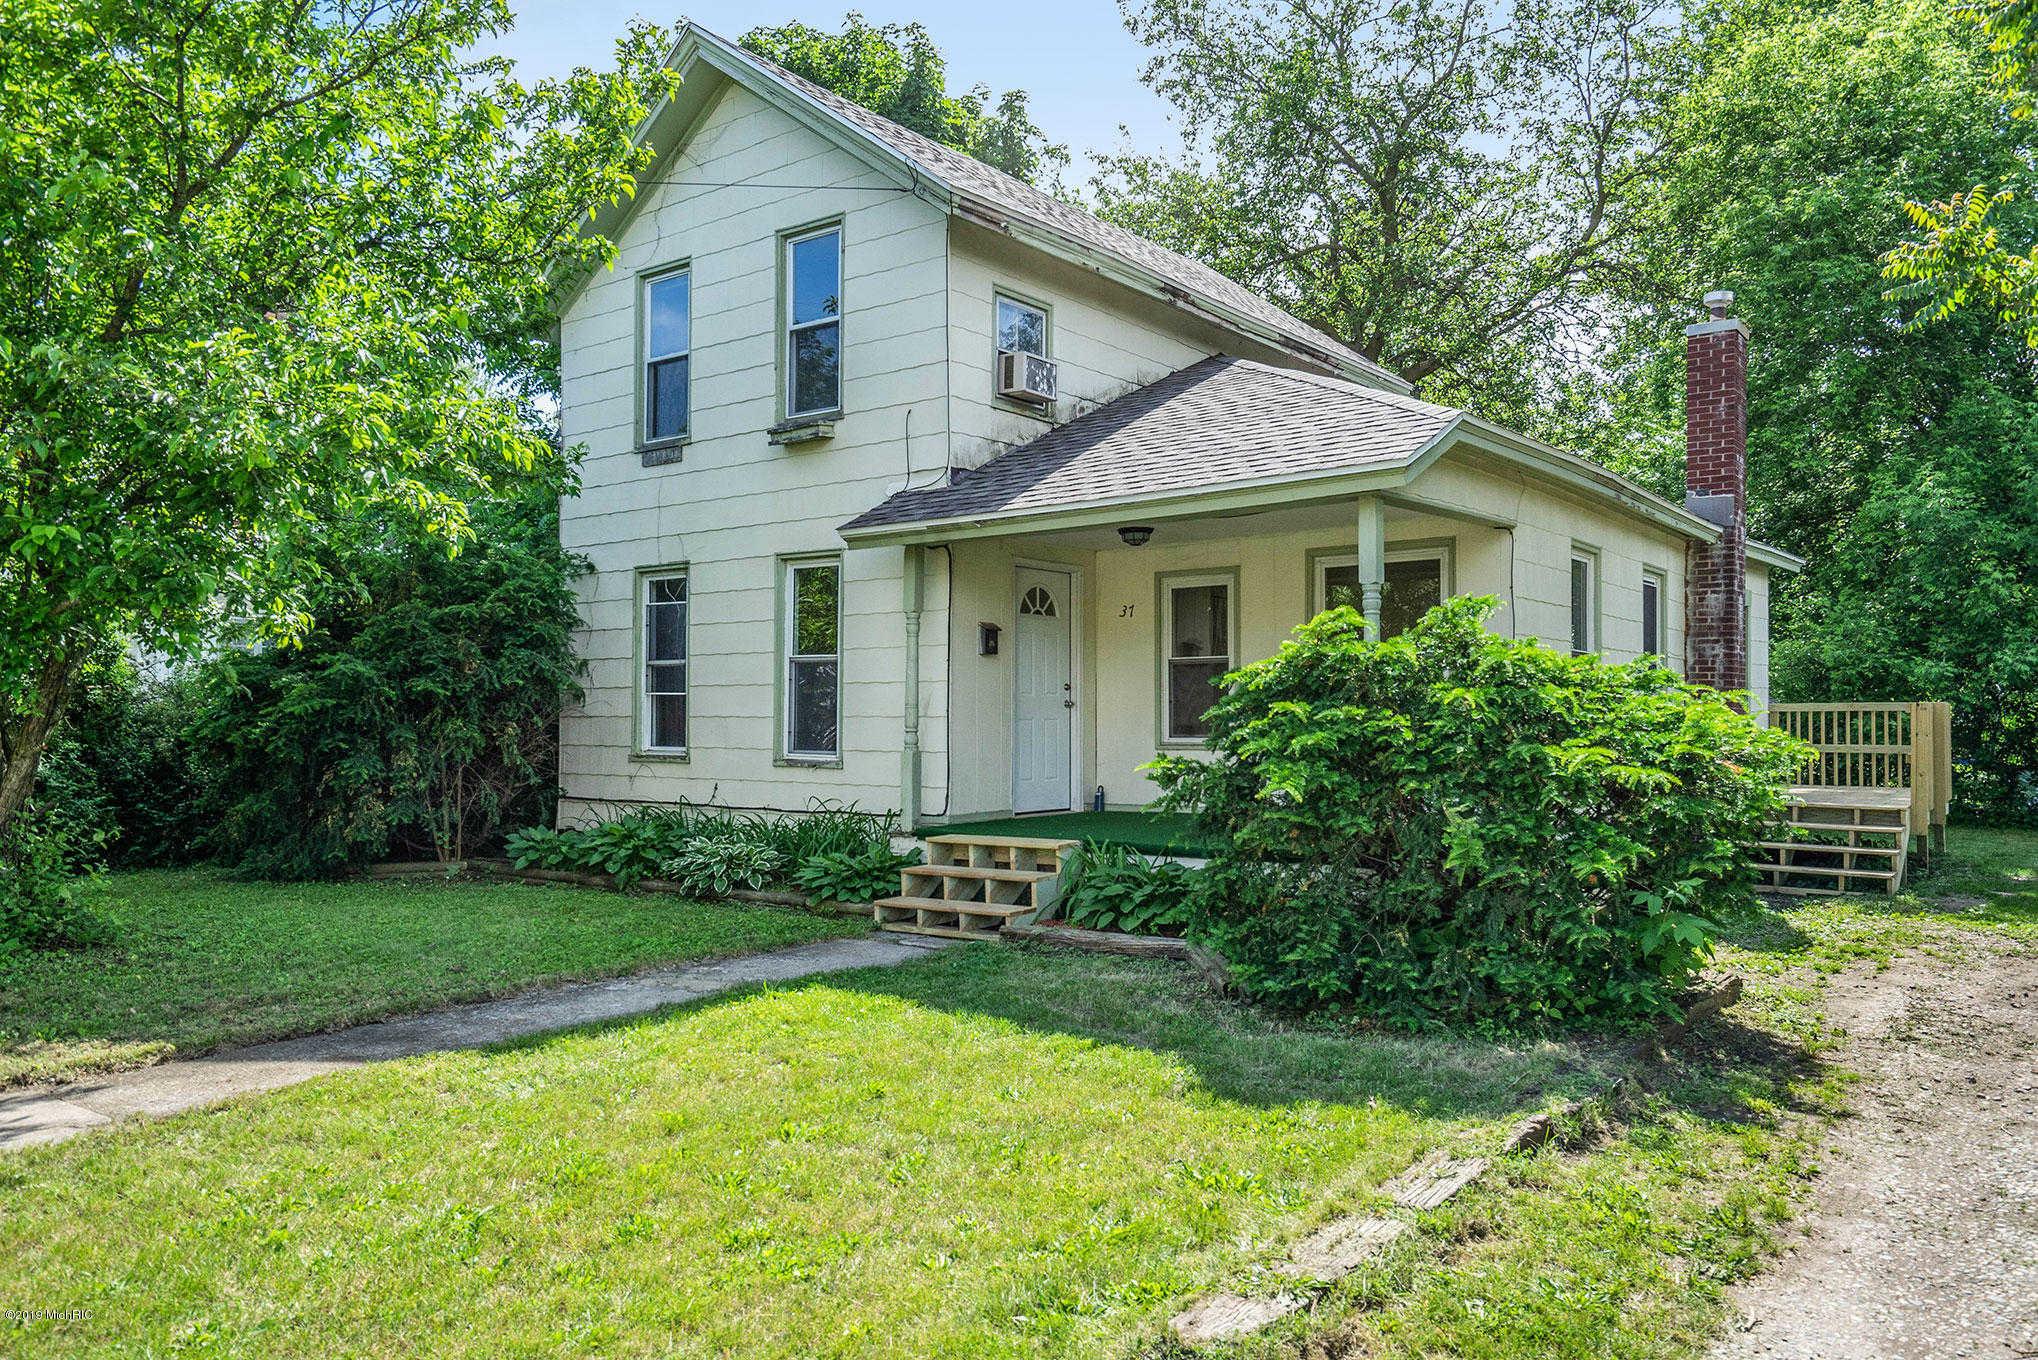 Homes For Sale In Sparta Michigan Bialik Real Estate Llc